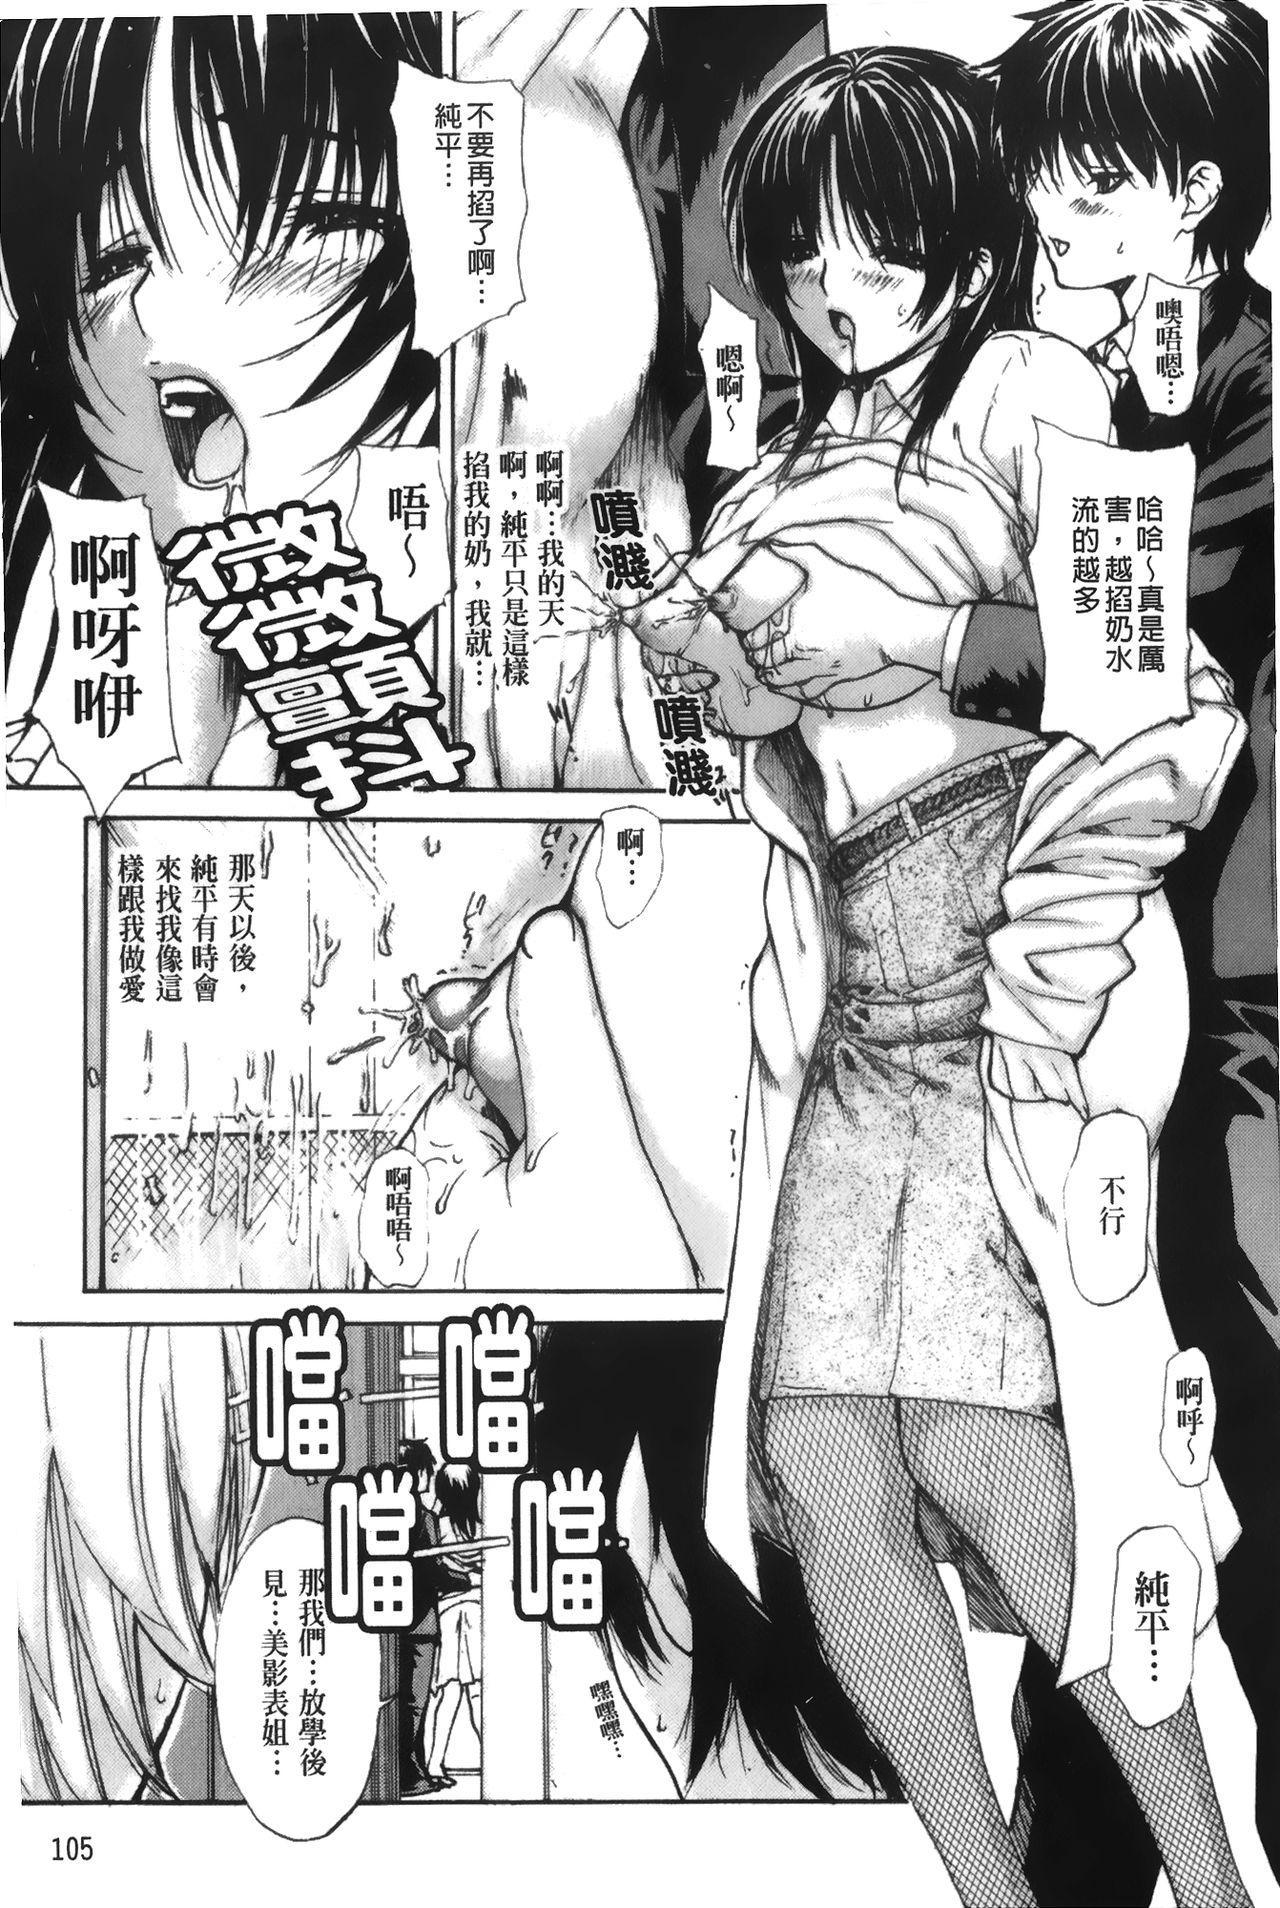 Tonari no Minano Sensei 4 | 隔壁的美奈乃老師 4 106